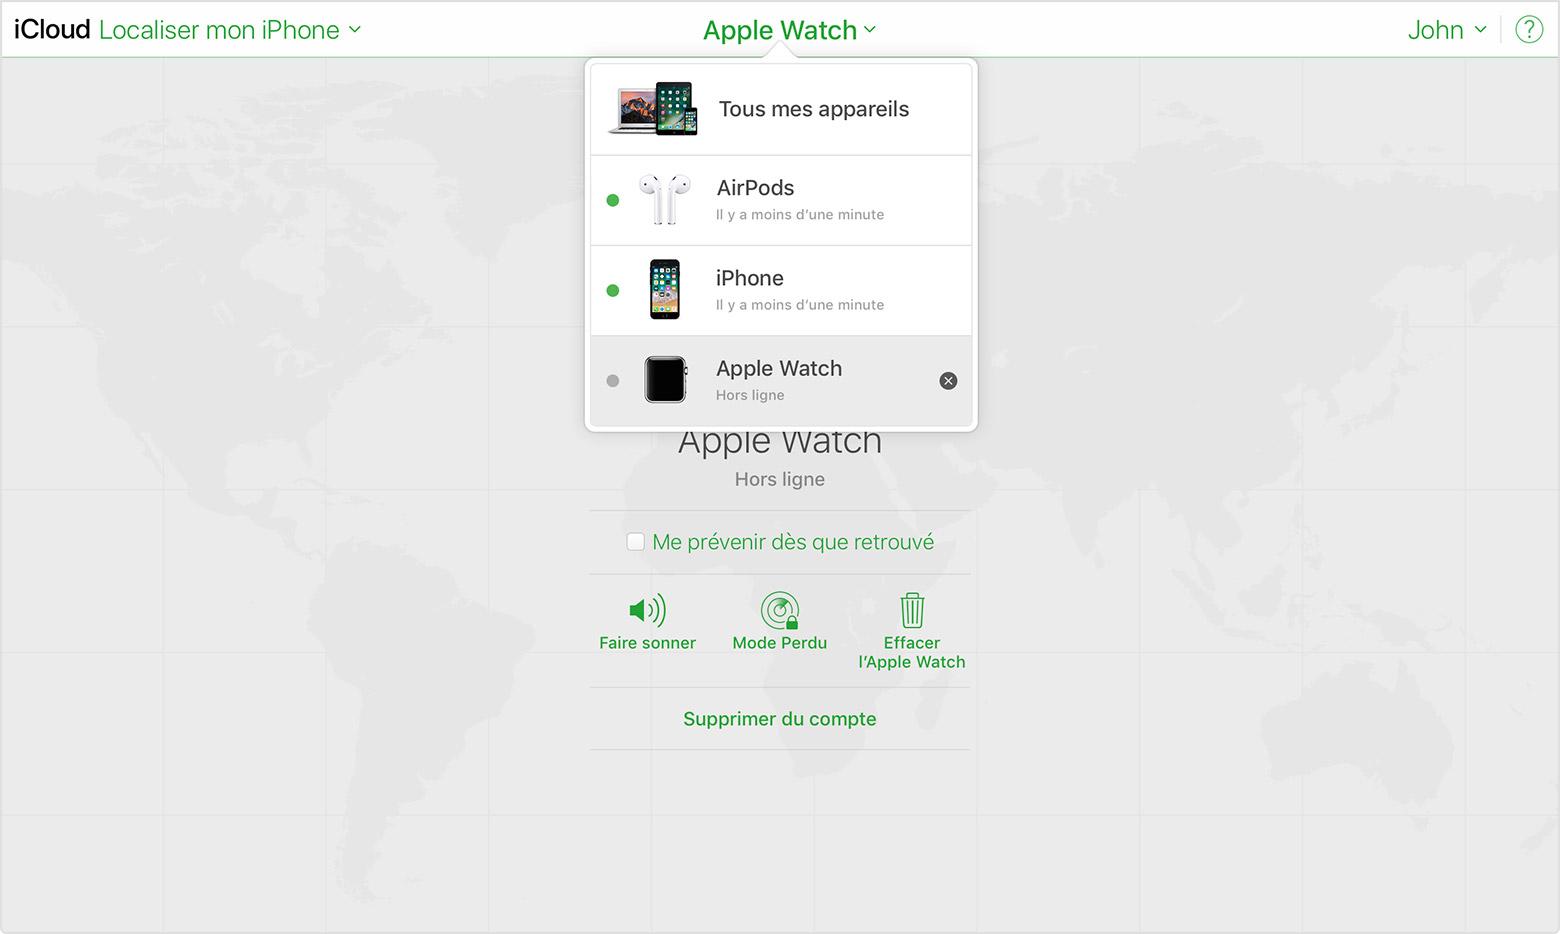 Icloud Localiser Iphone Deconnecte